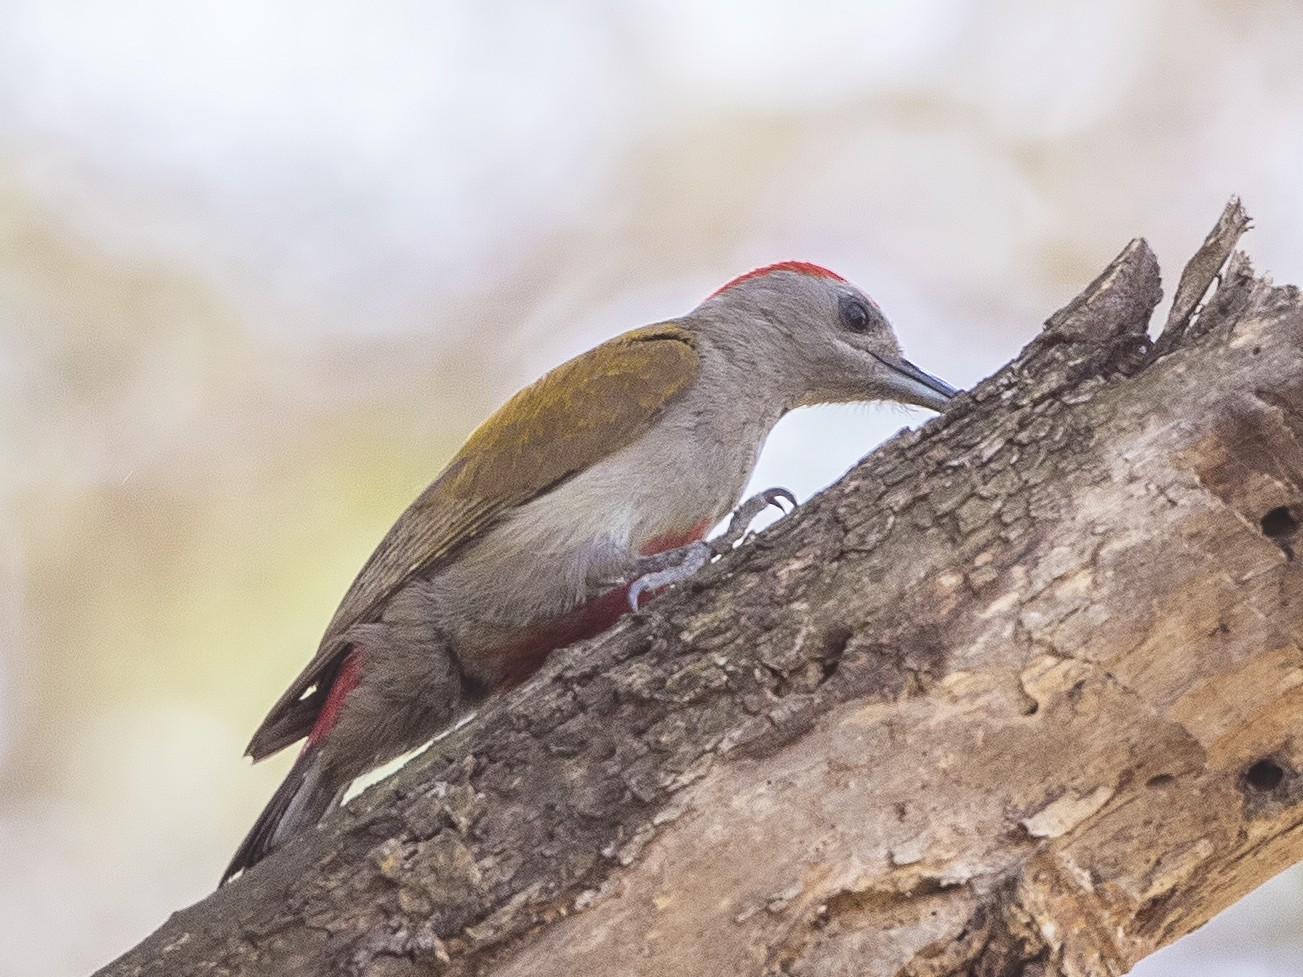 African Gray Woodpecker - H. Çağlar Güngör